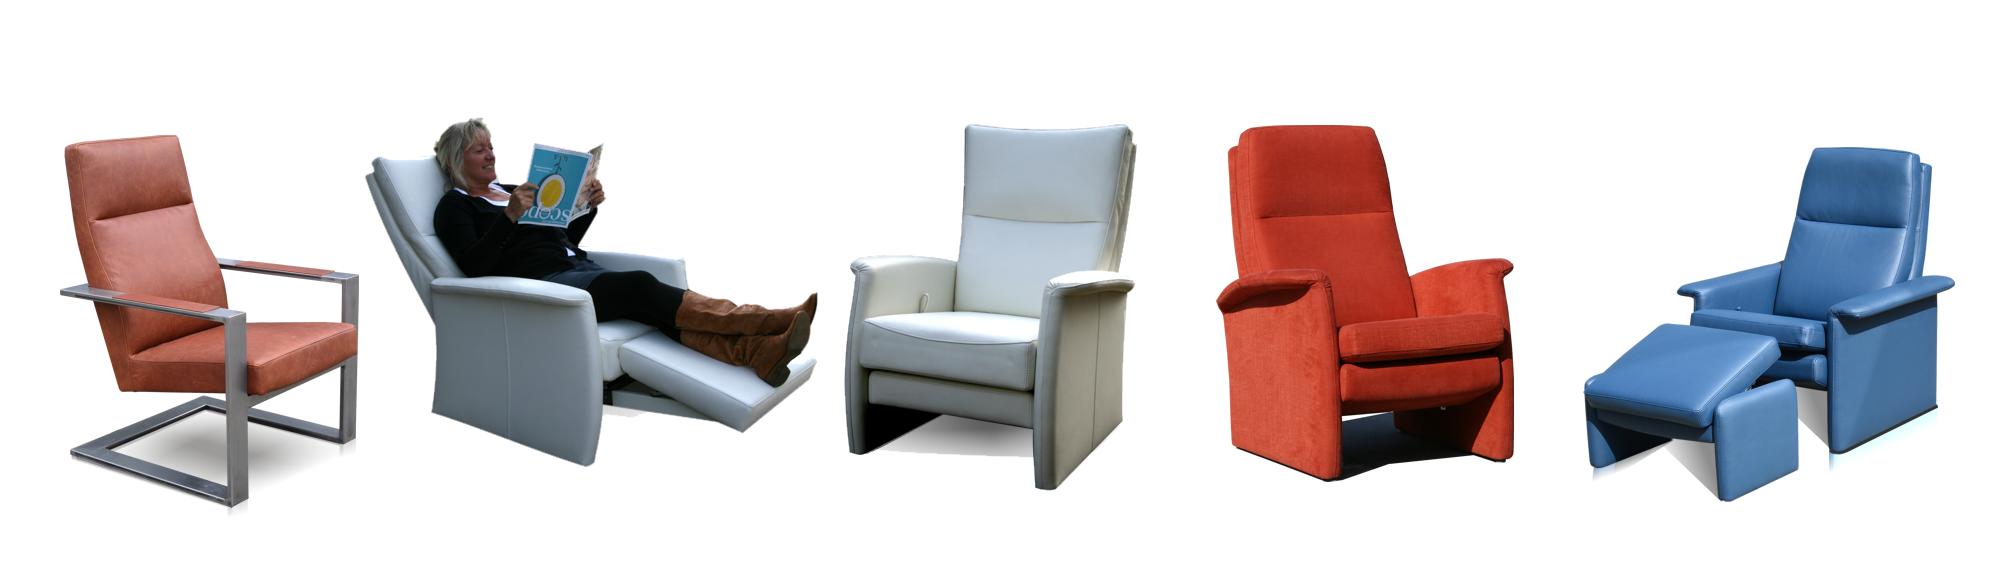 perida.nl fauteuils